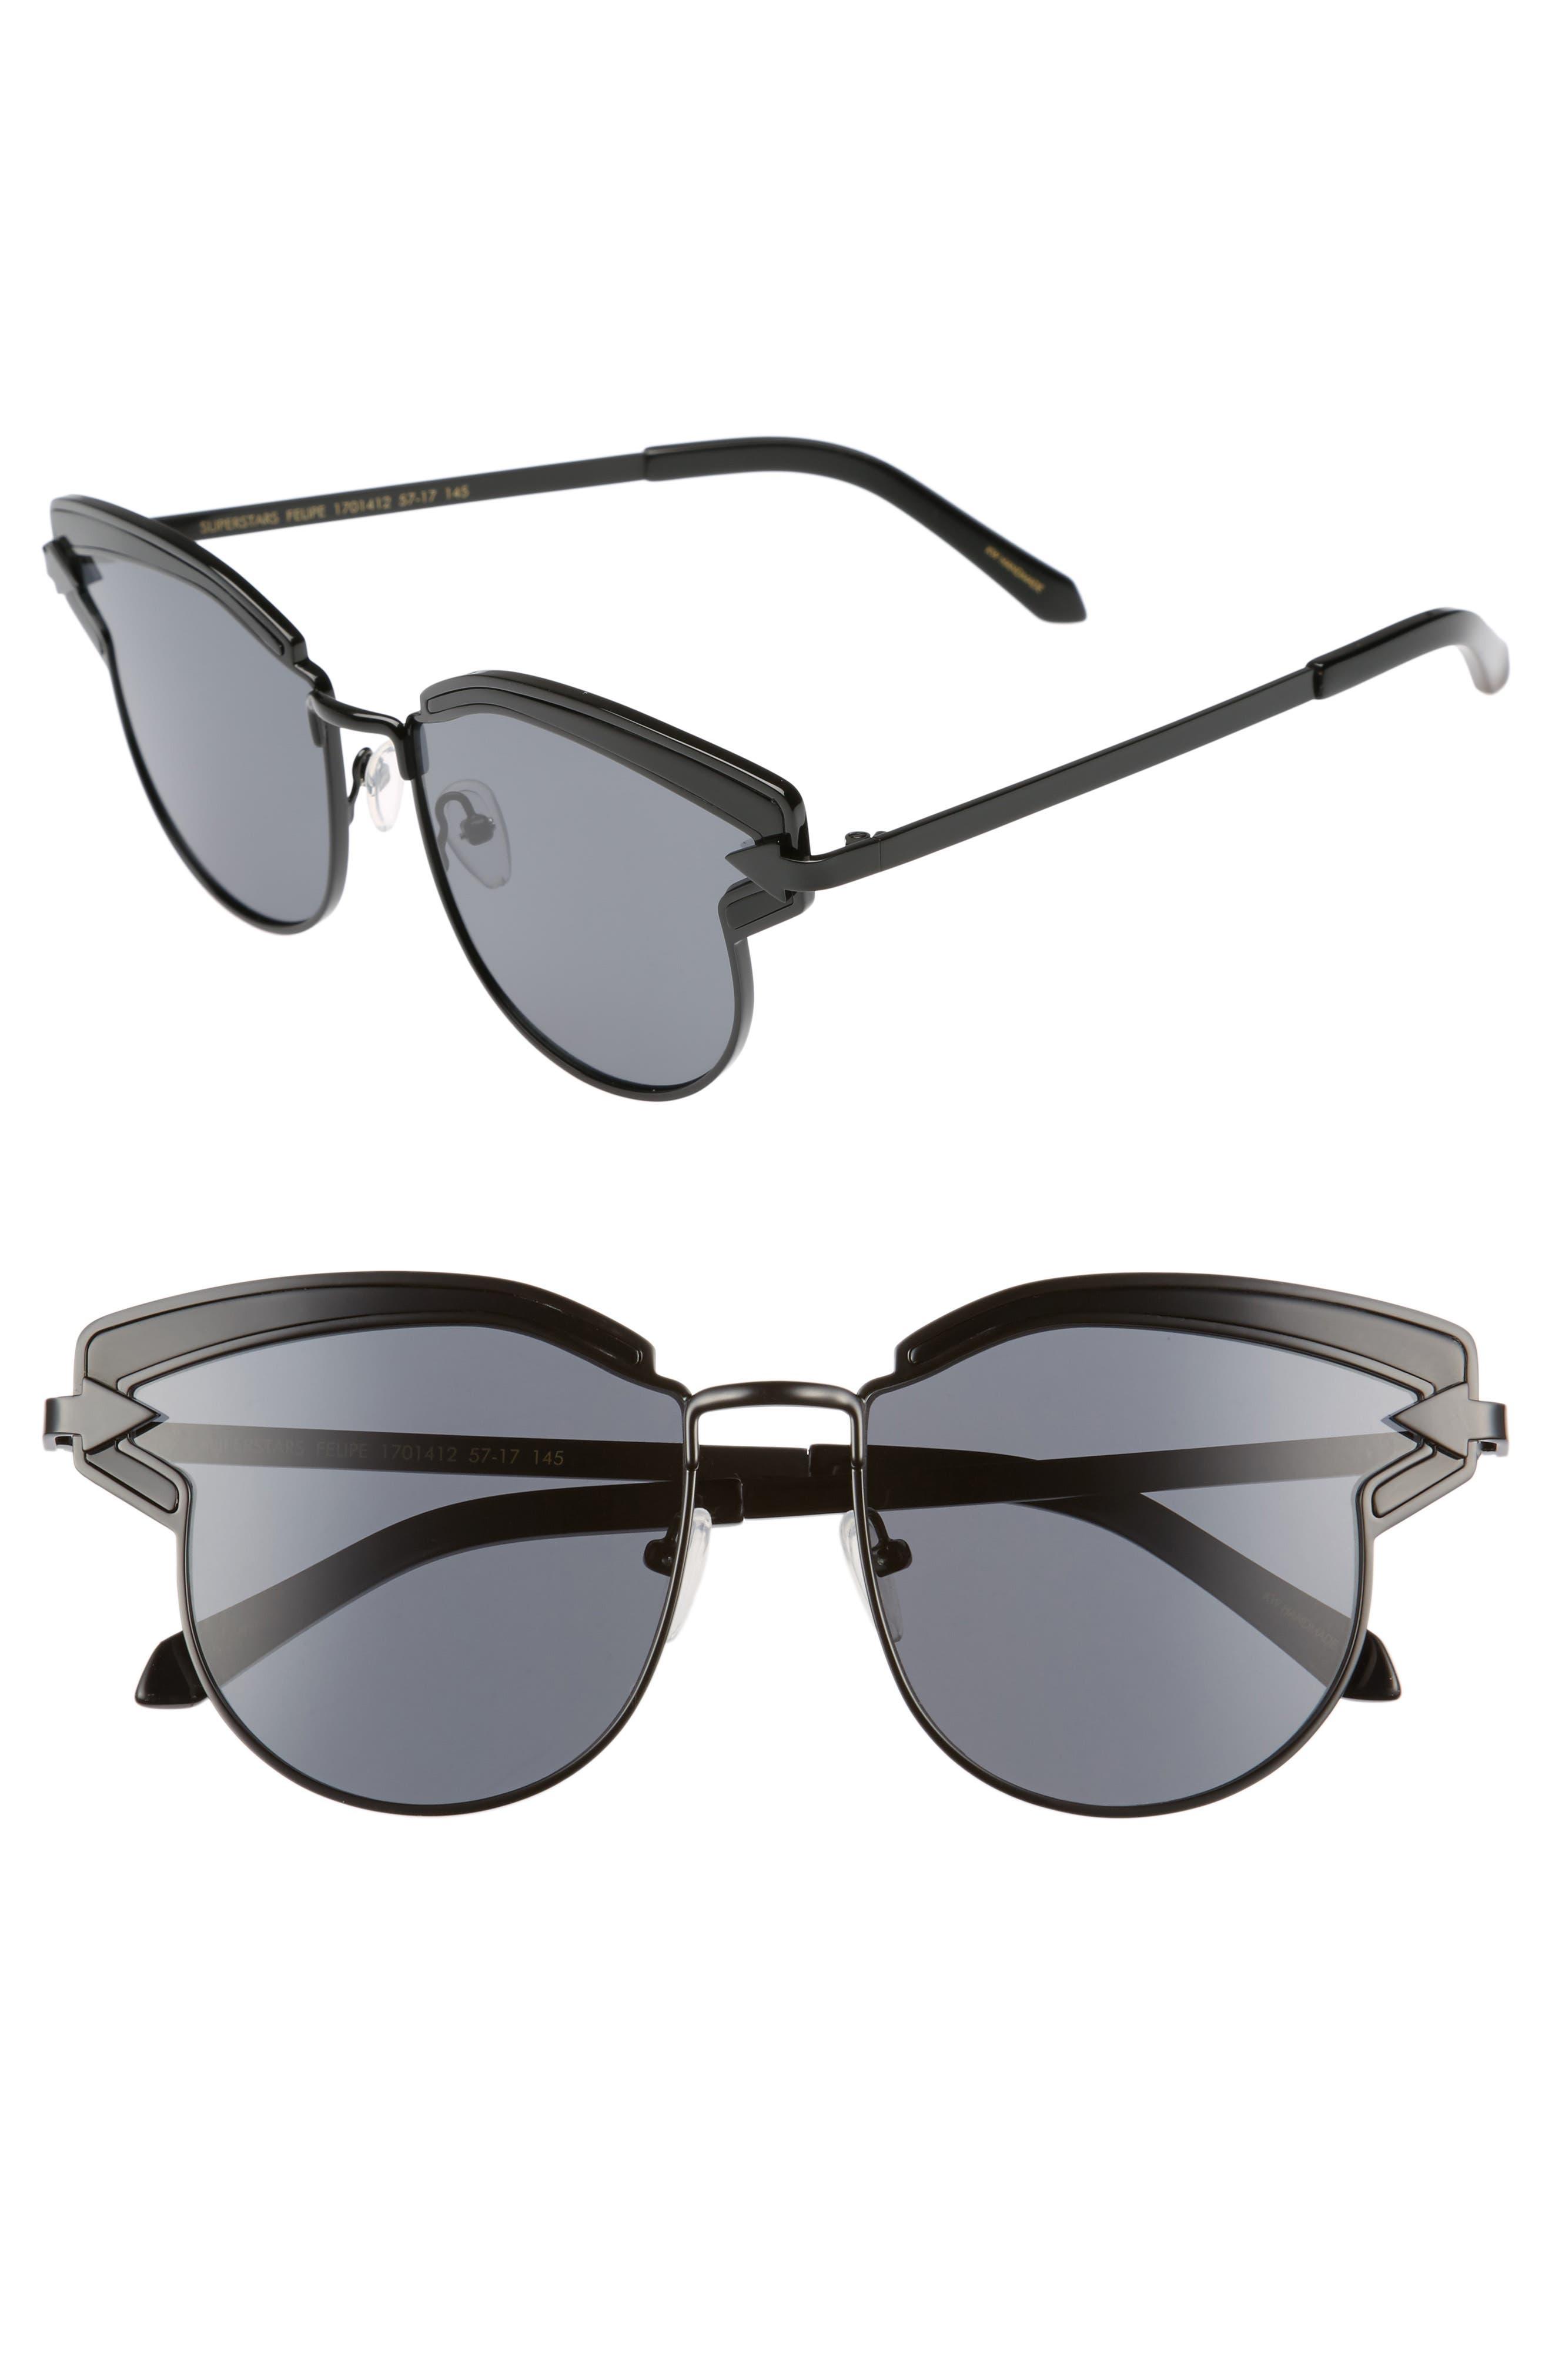 Buccaneer 47mm Round Sunglasses,                         Main,                         color,